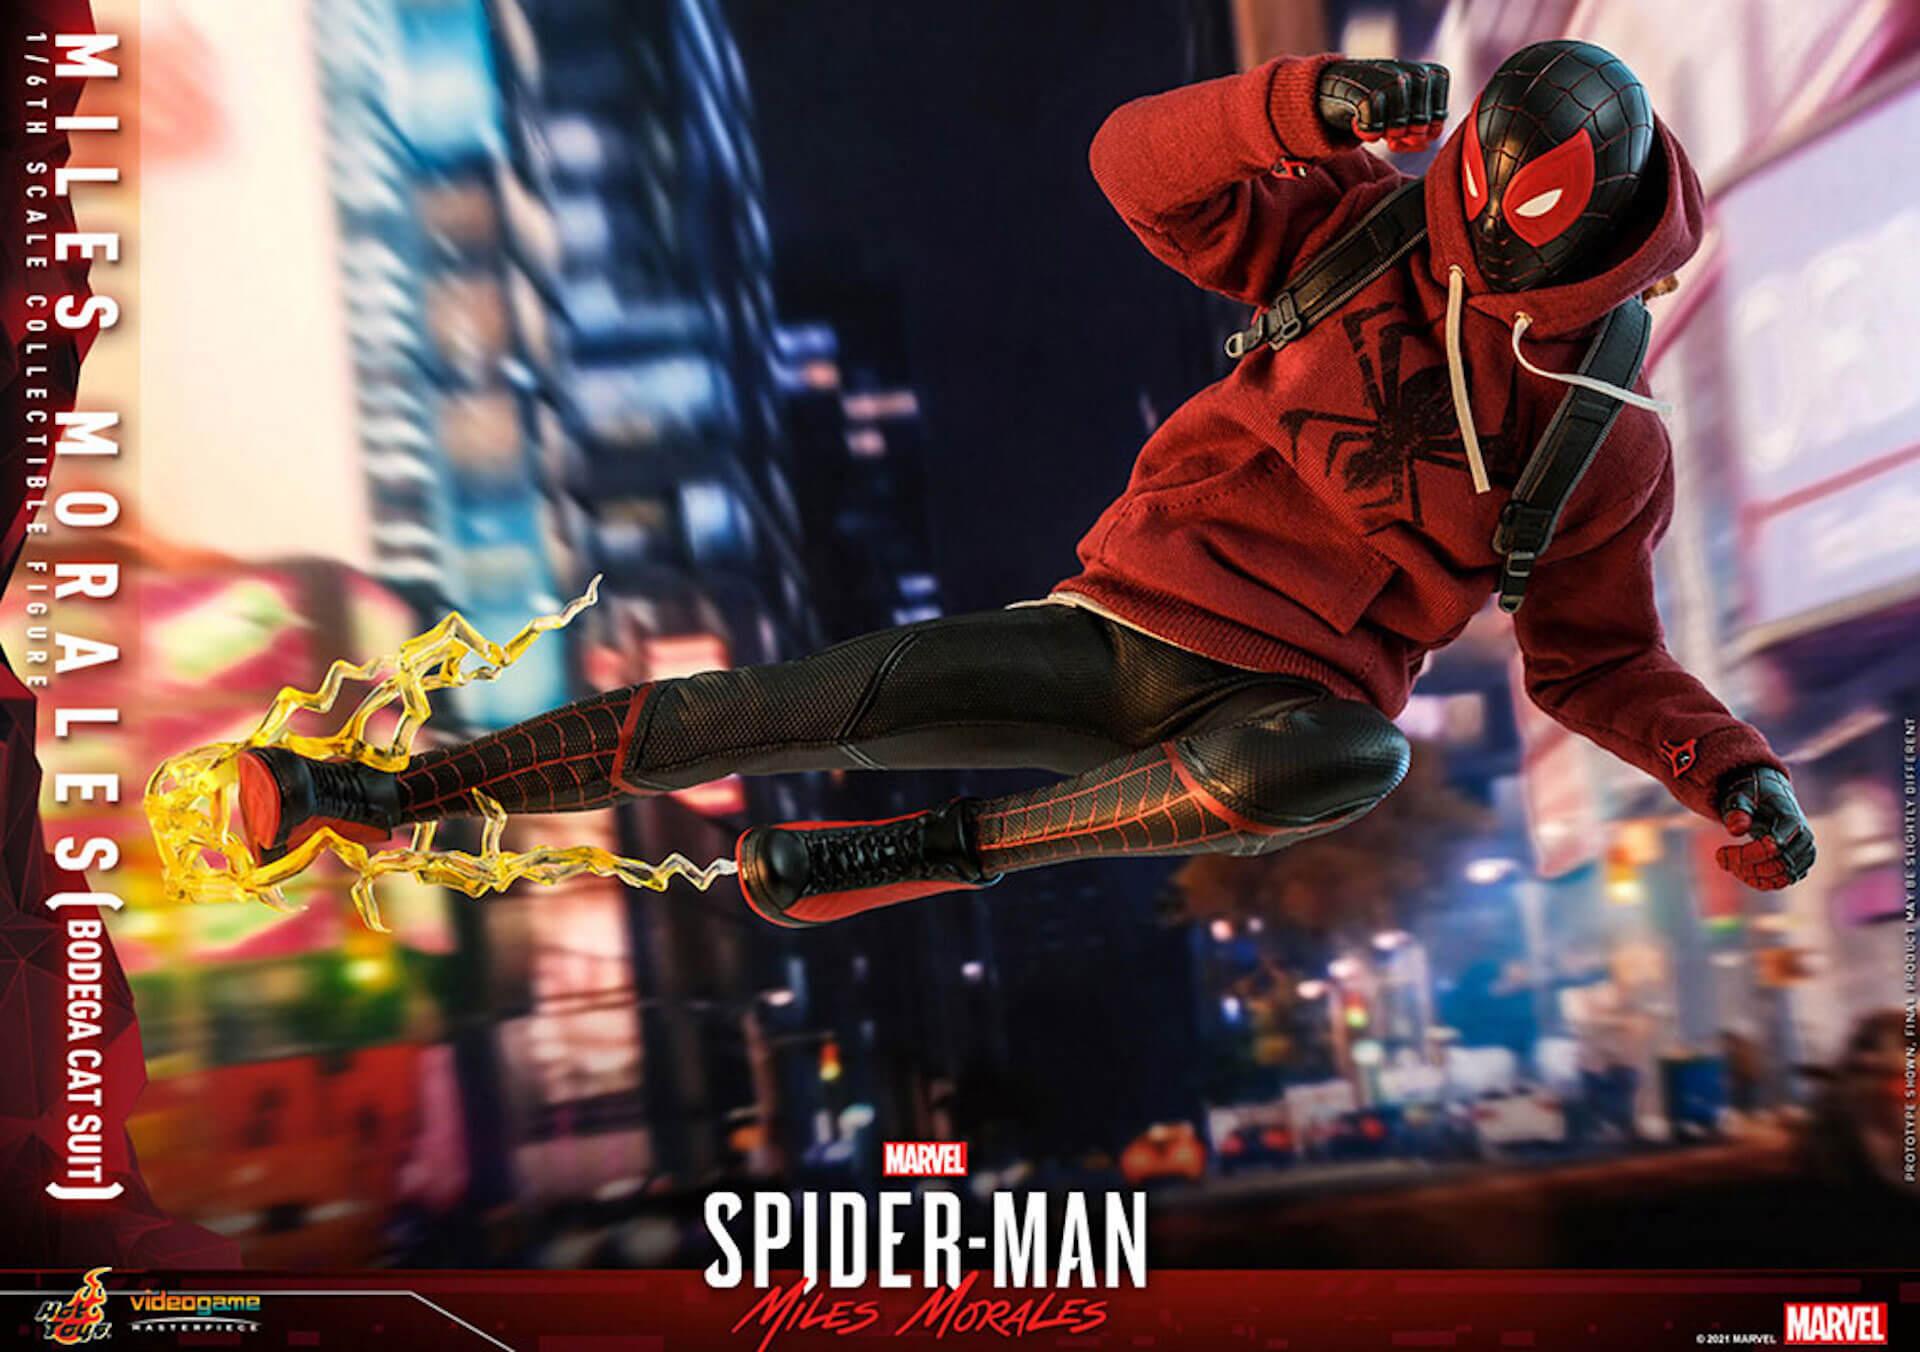 『Marvel's Spider-Man:Miles Morales』のスパイダーマンがホットトイズで超精巧なフィギュアになって登場! art210601_spiderman_hottoys_11